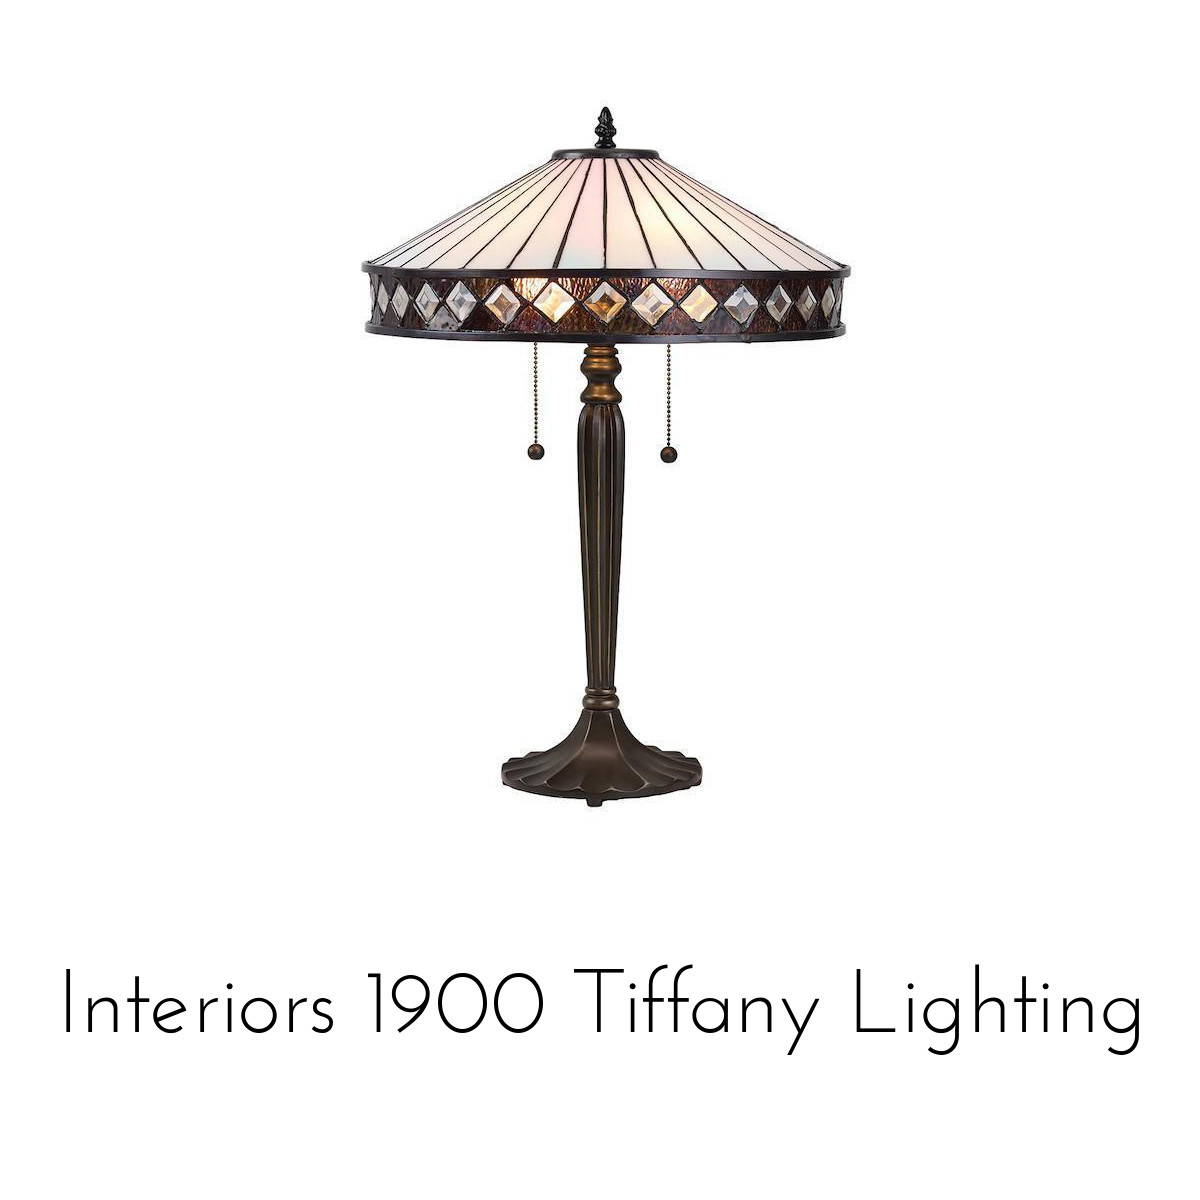 interiors 1900 tiffany lighting